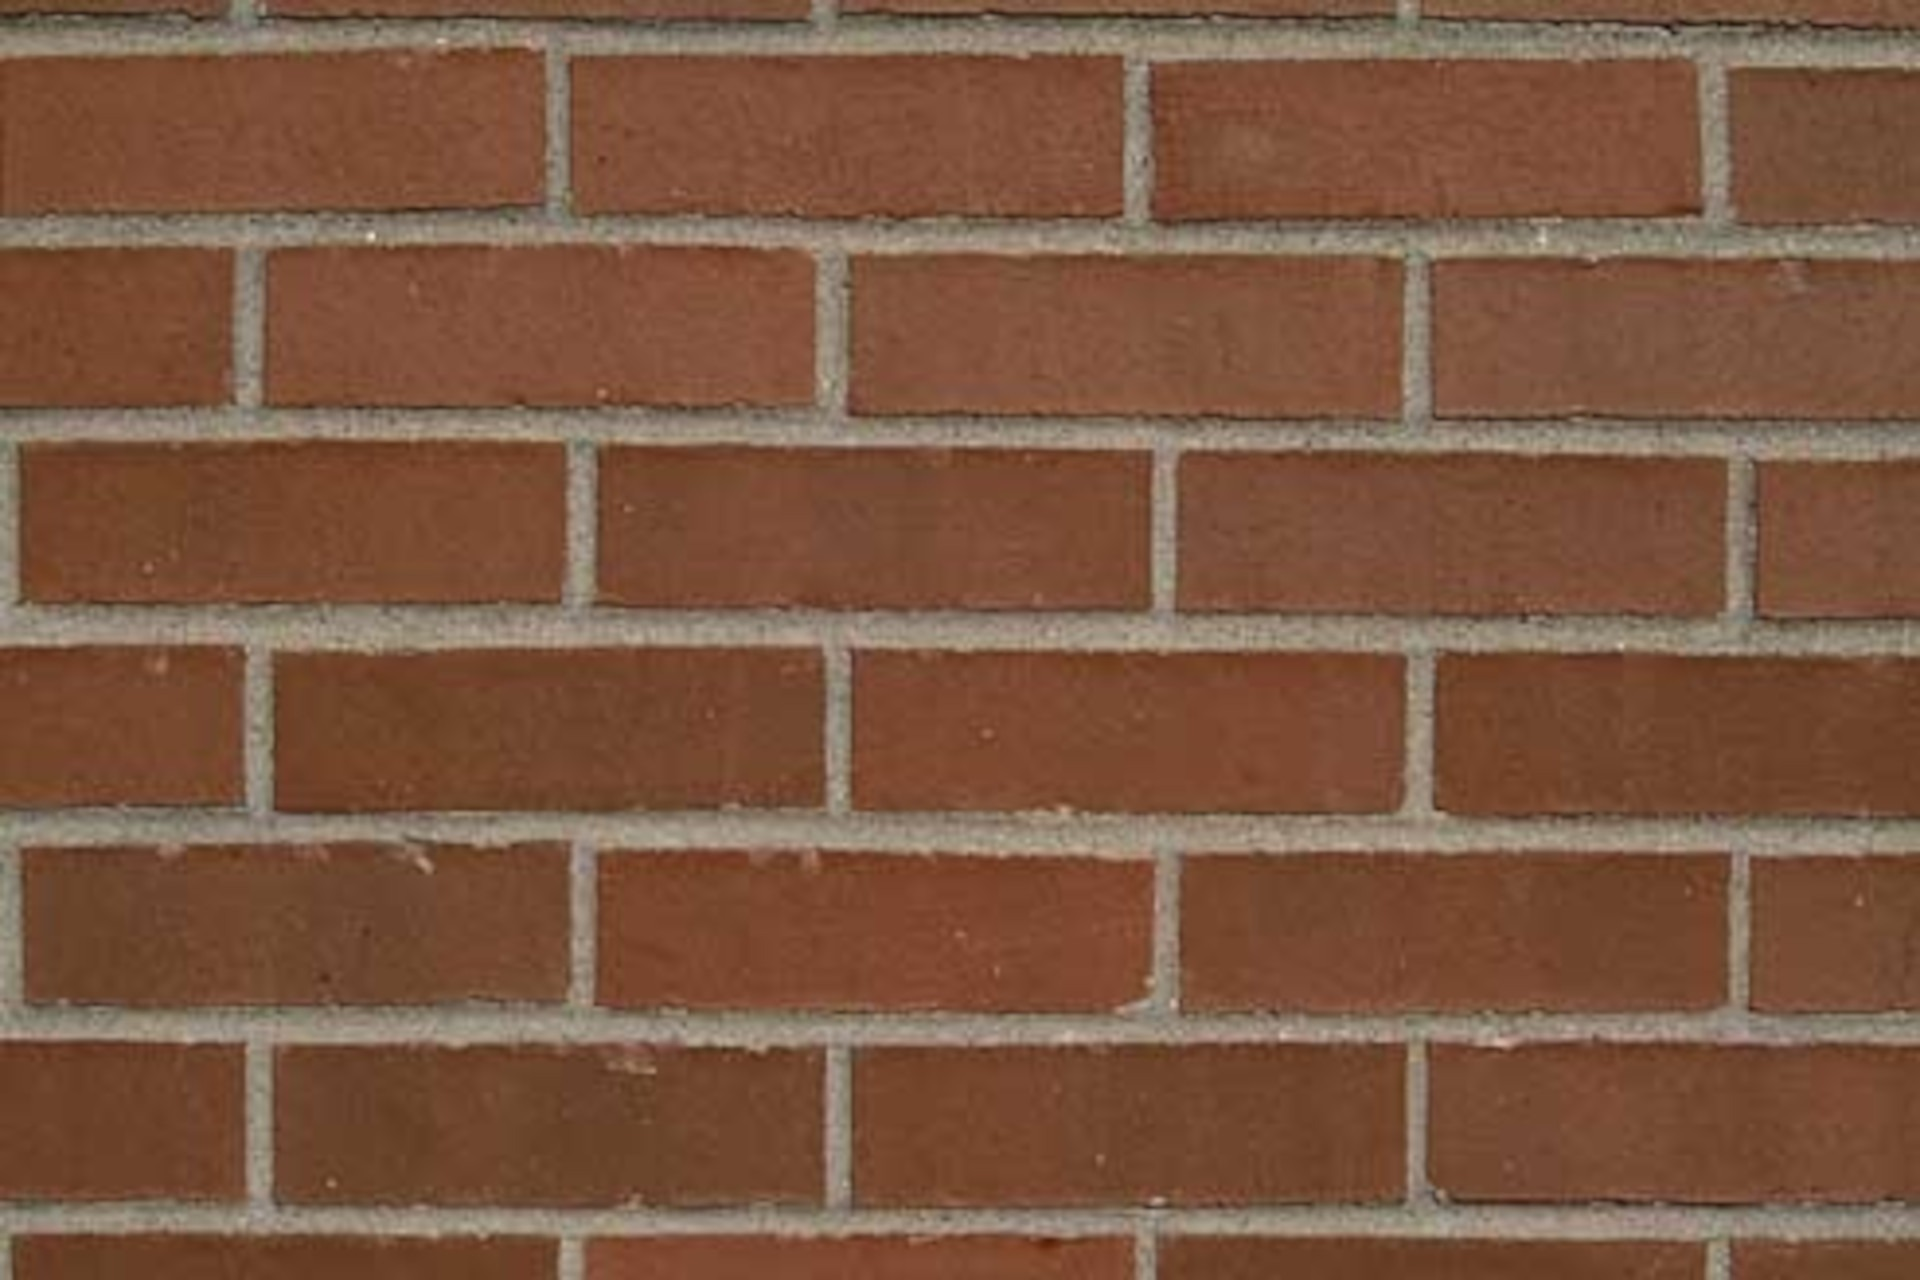 Brown Smooth Modular Brick